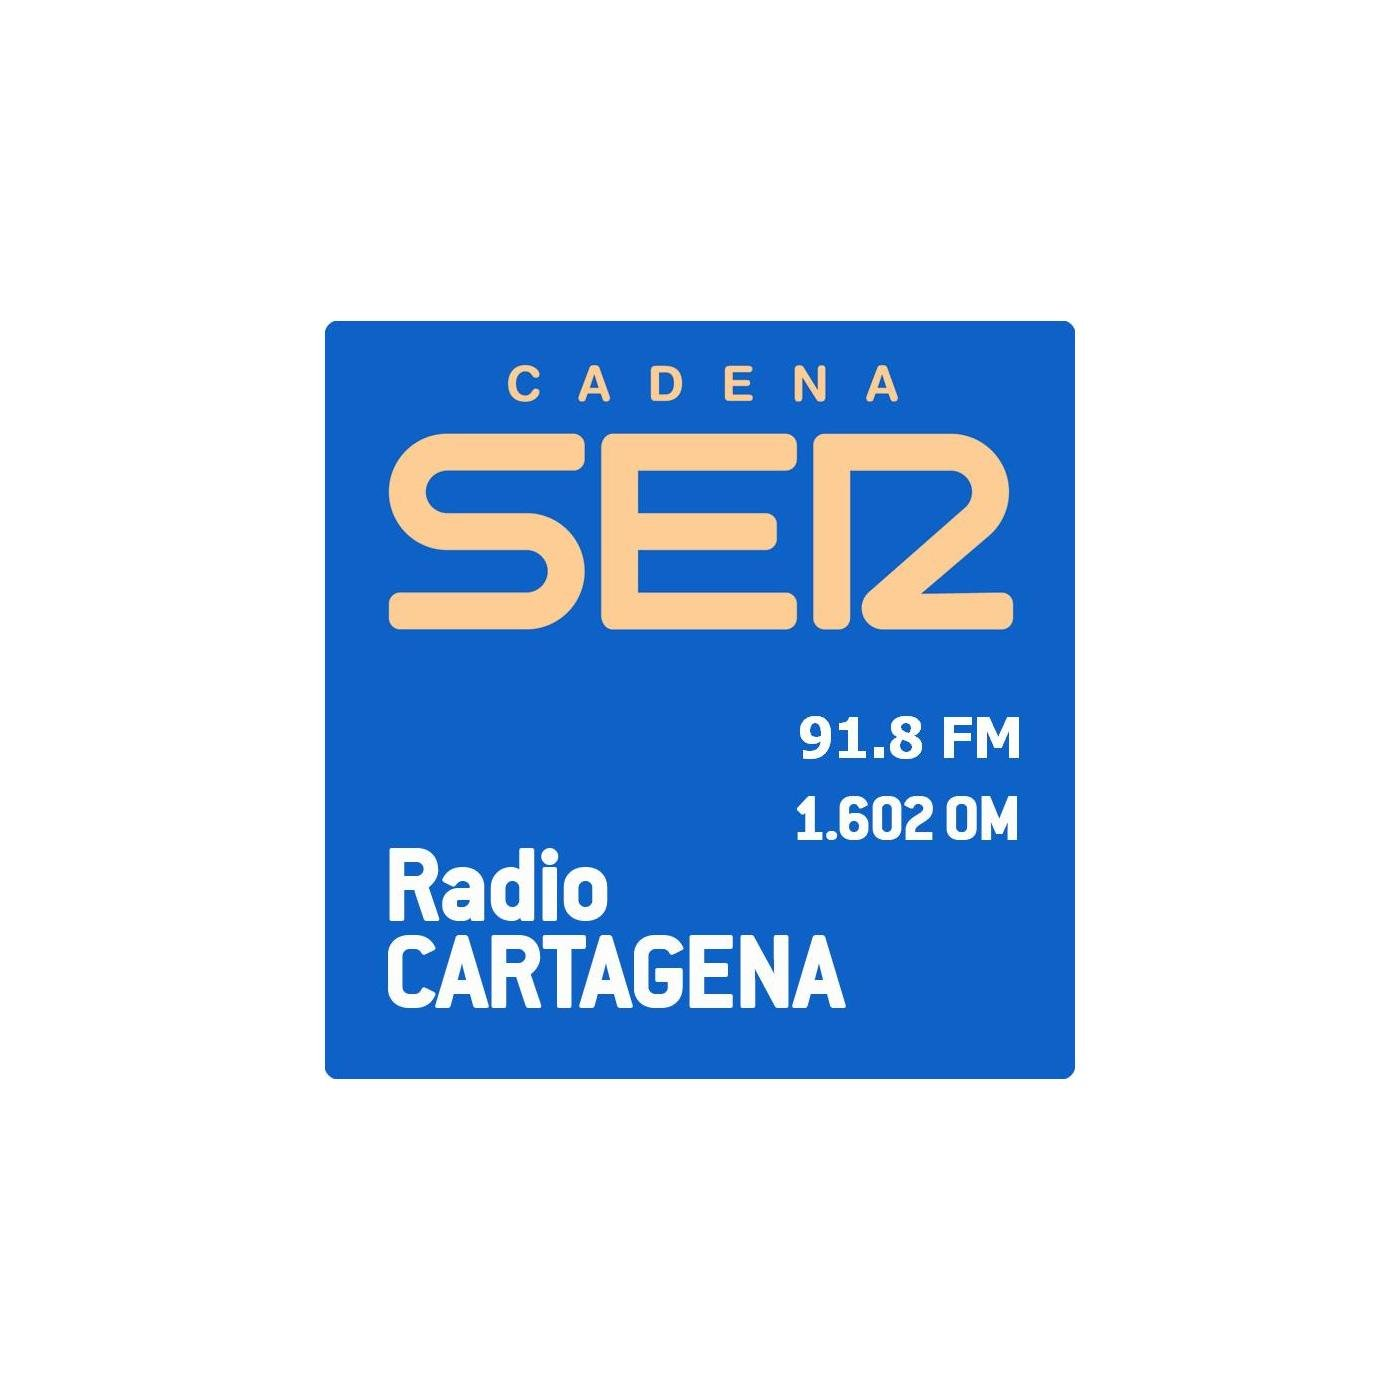 <![CDATA[Radio Cartagena Cadena Ser]]>